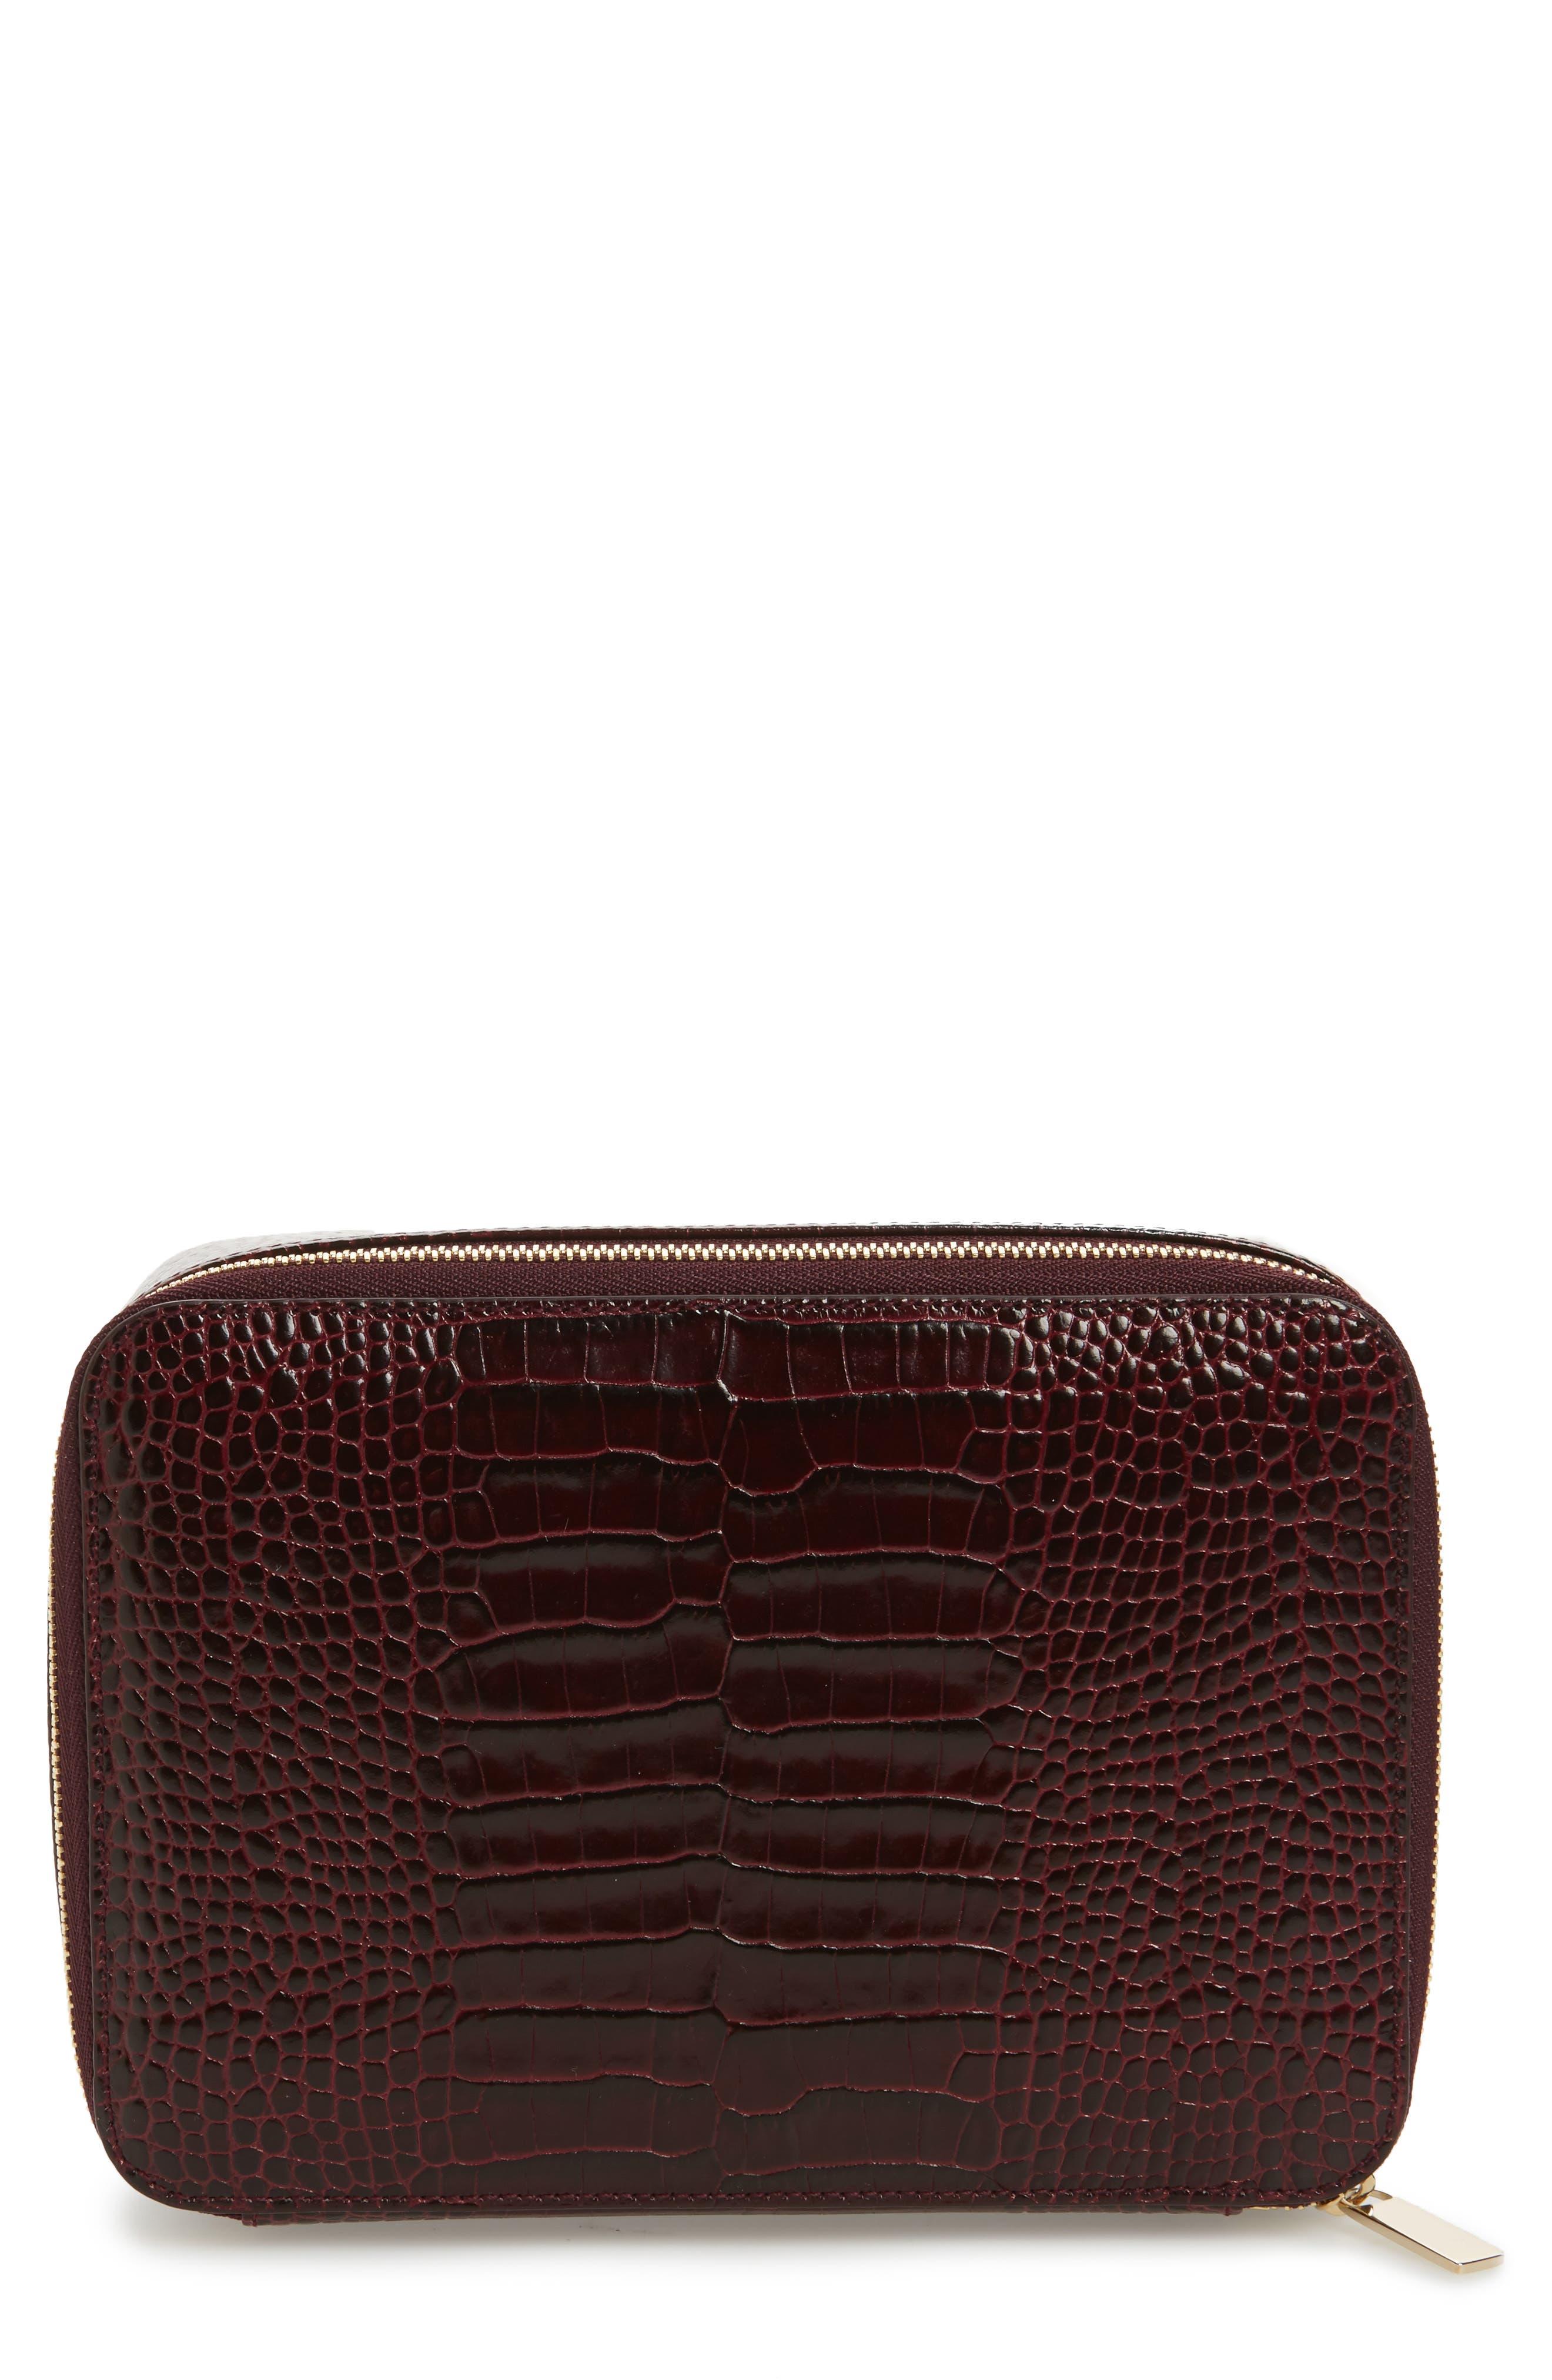 Mara Square Croc Embossed Leather Travel Case,                         Main,                         color, 930